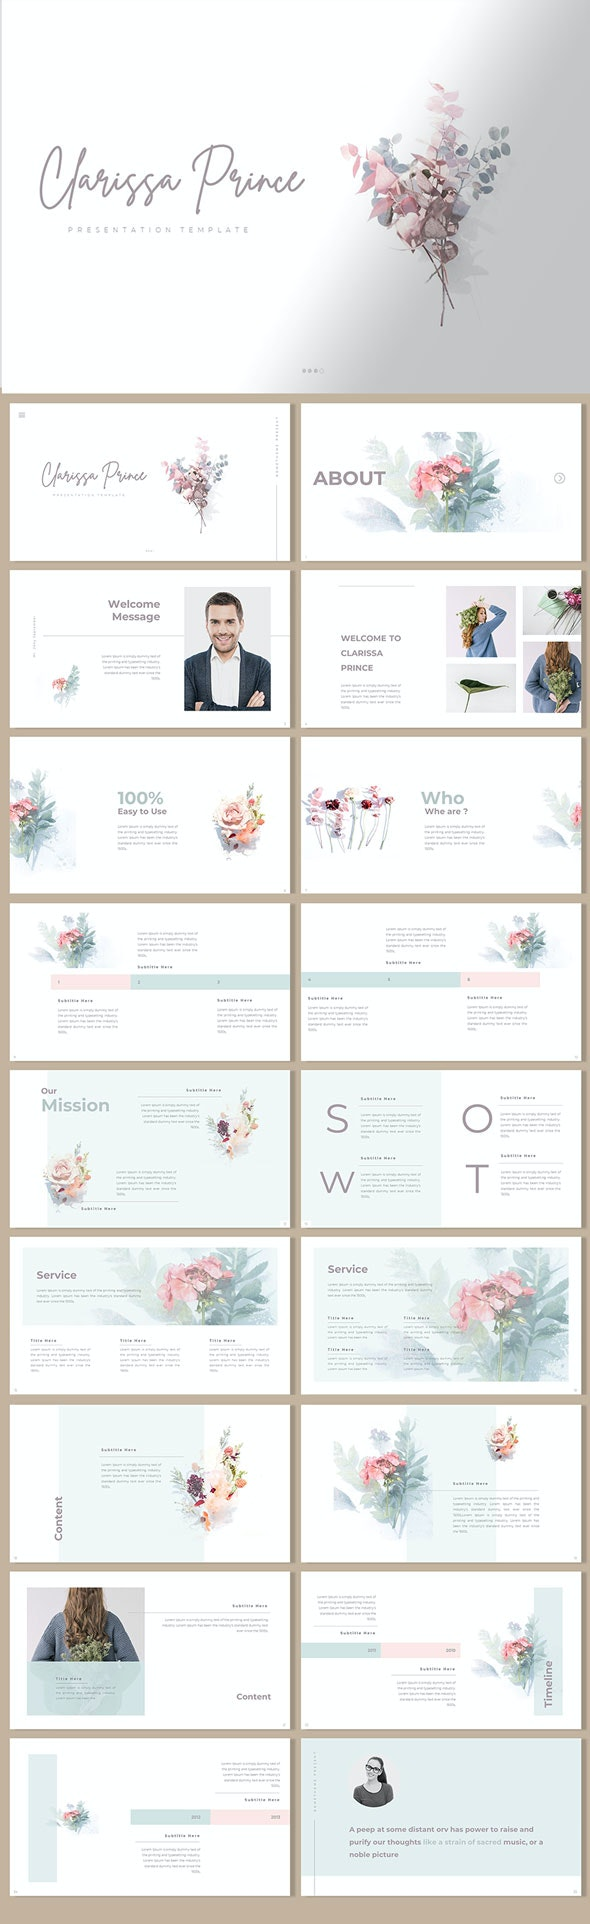 Clarissa Prince - Presentation Template - Creative PowerPoint Templates